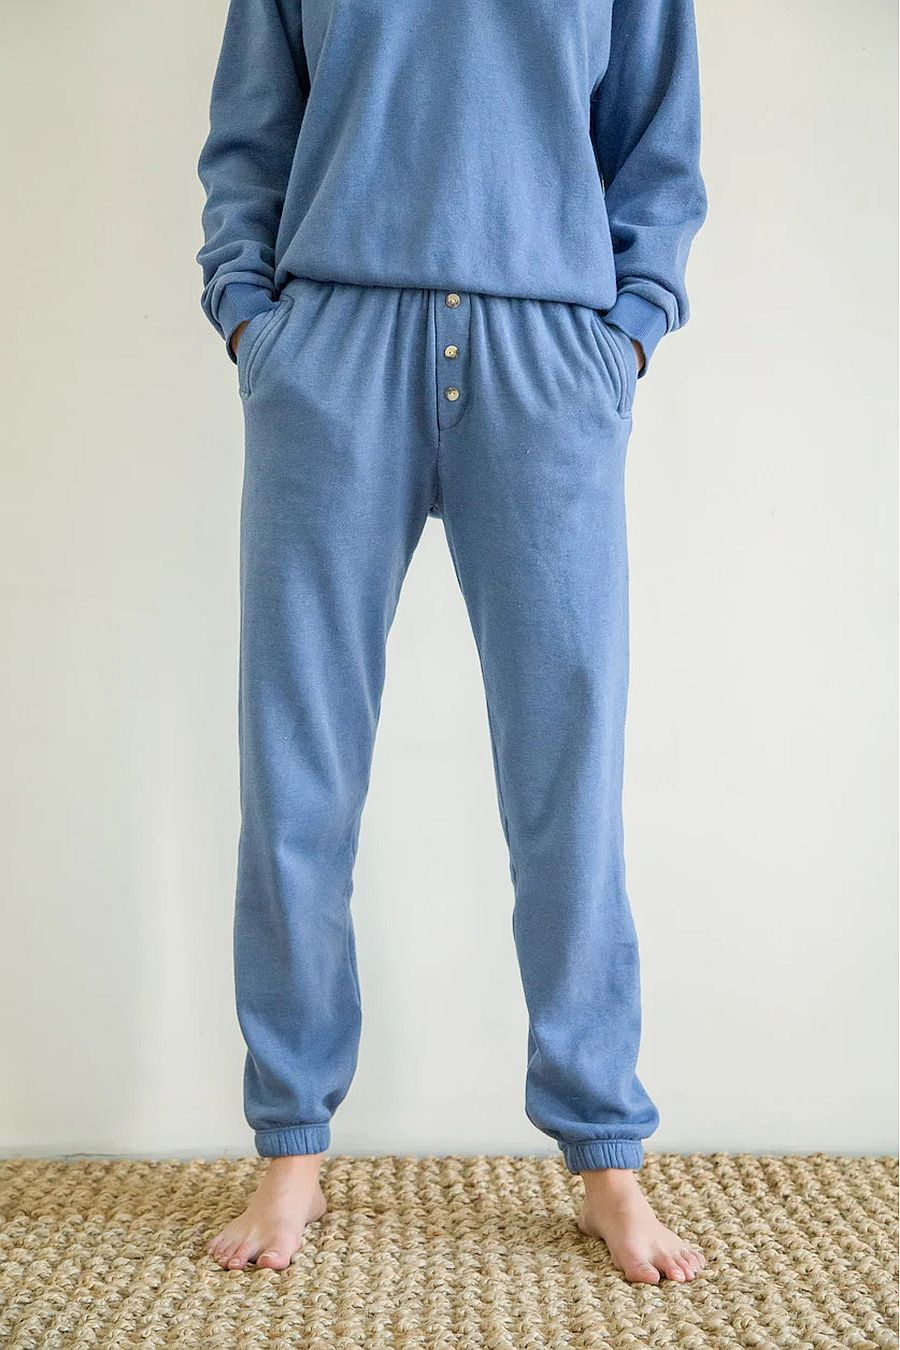 DONNI. Vintage Fleece Joggers - Indigo